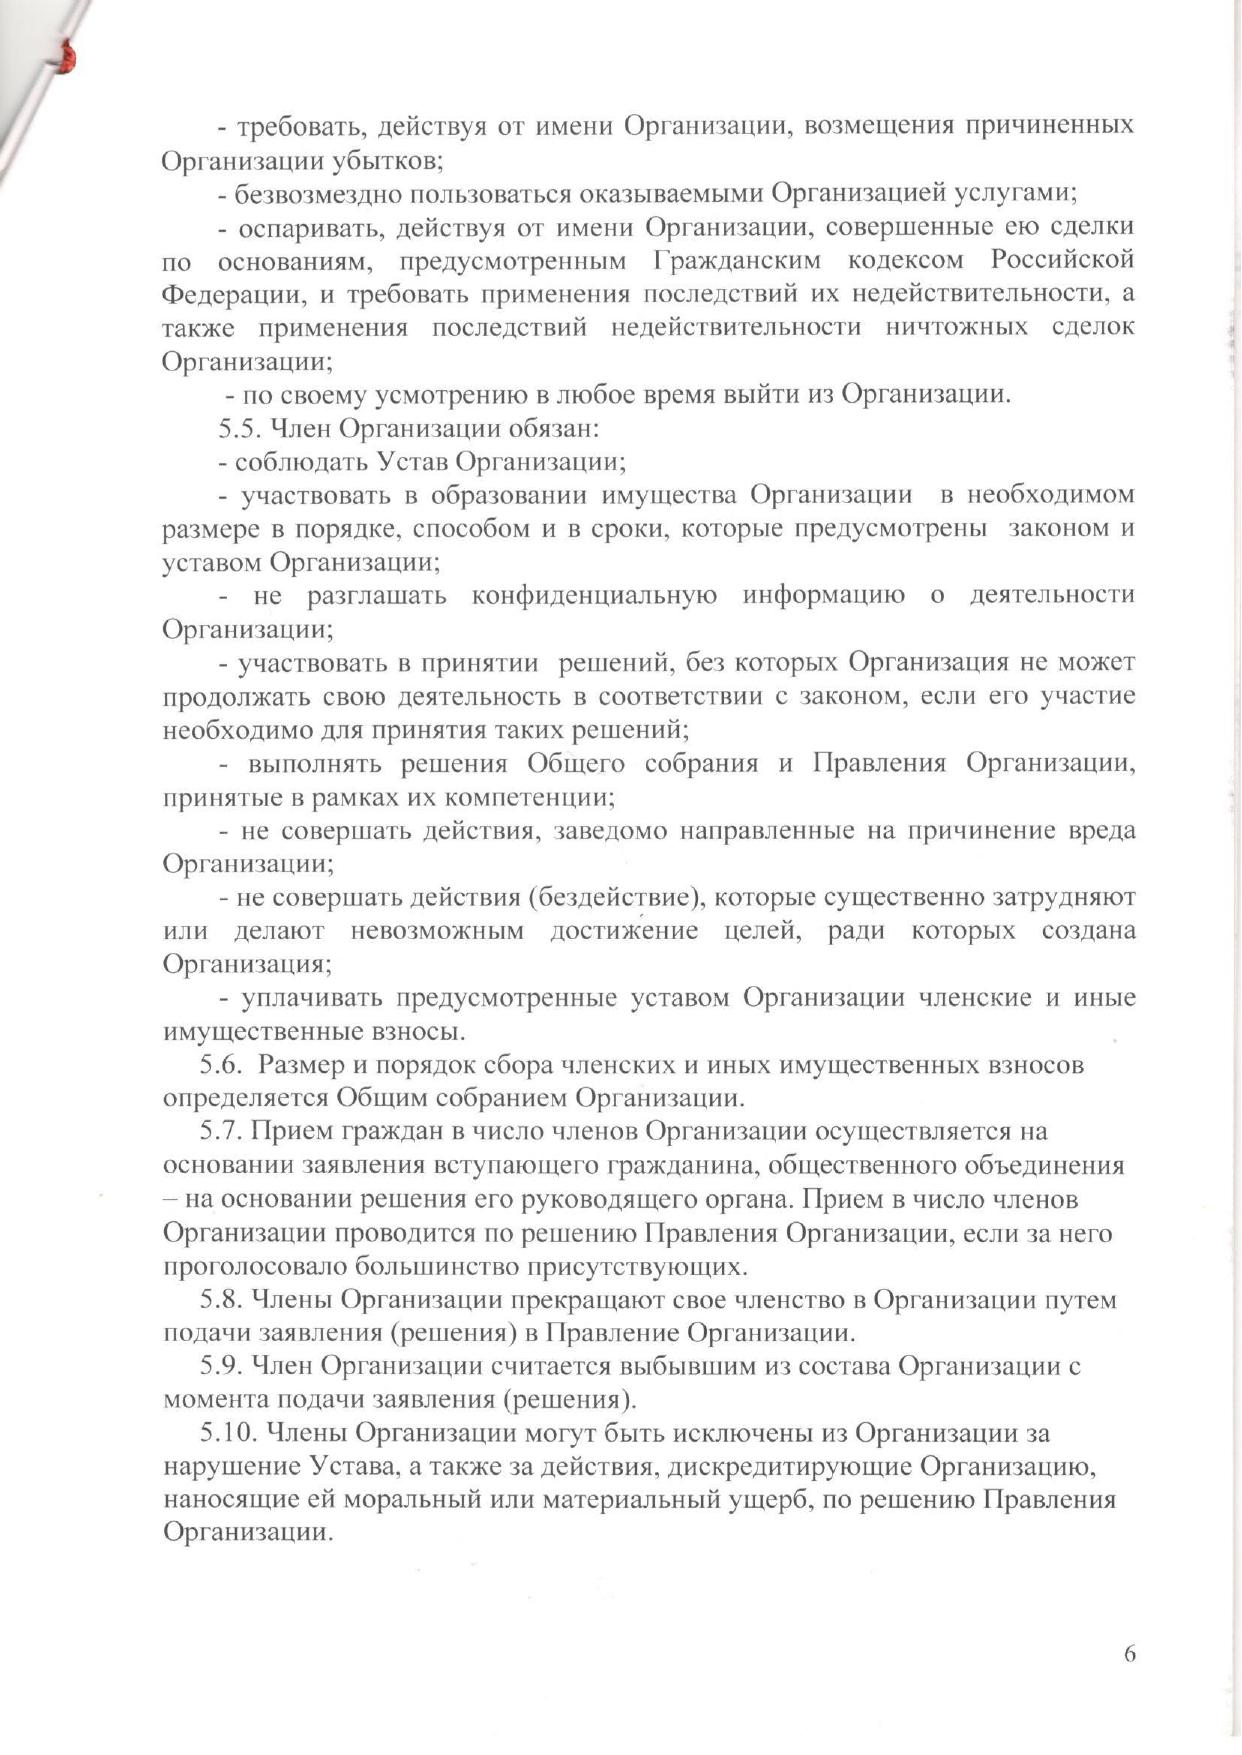 Устав_pages-to-jpg-0006